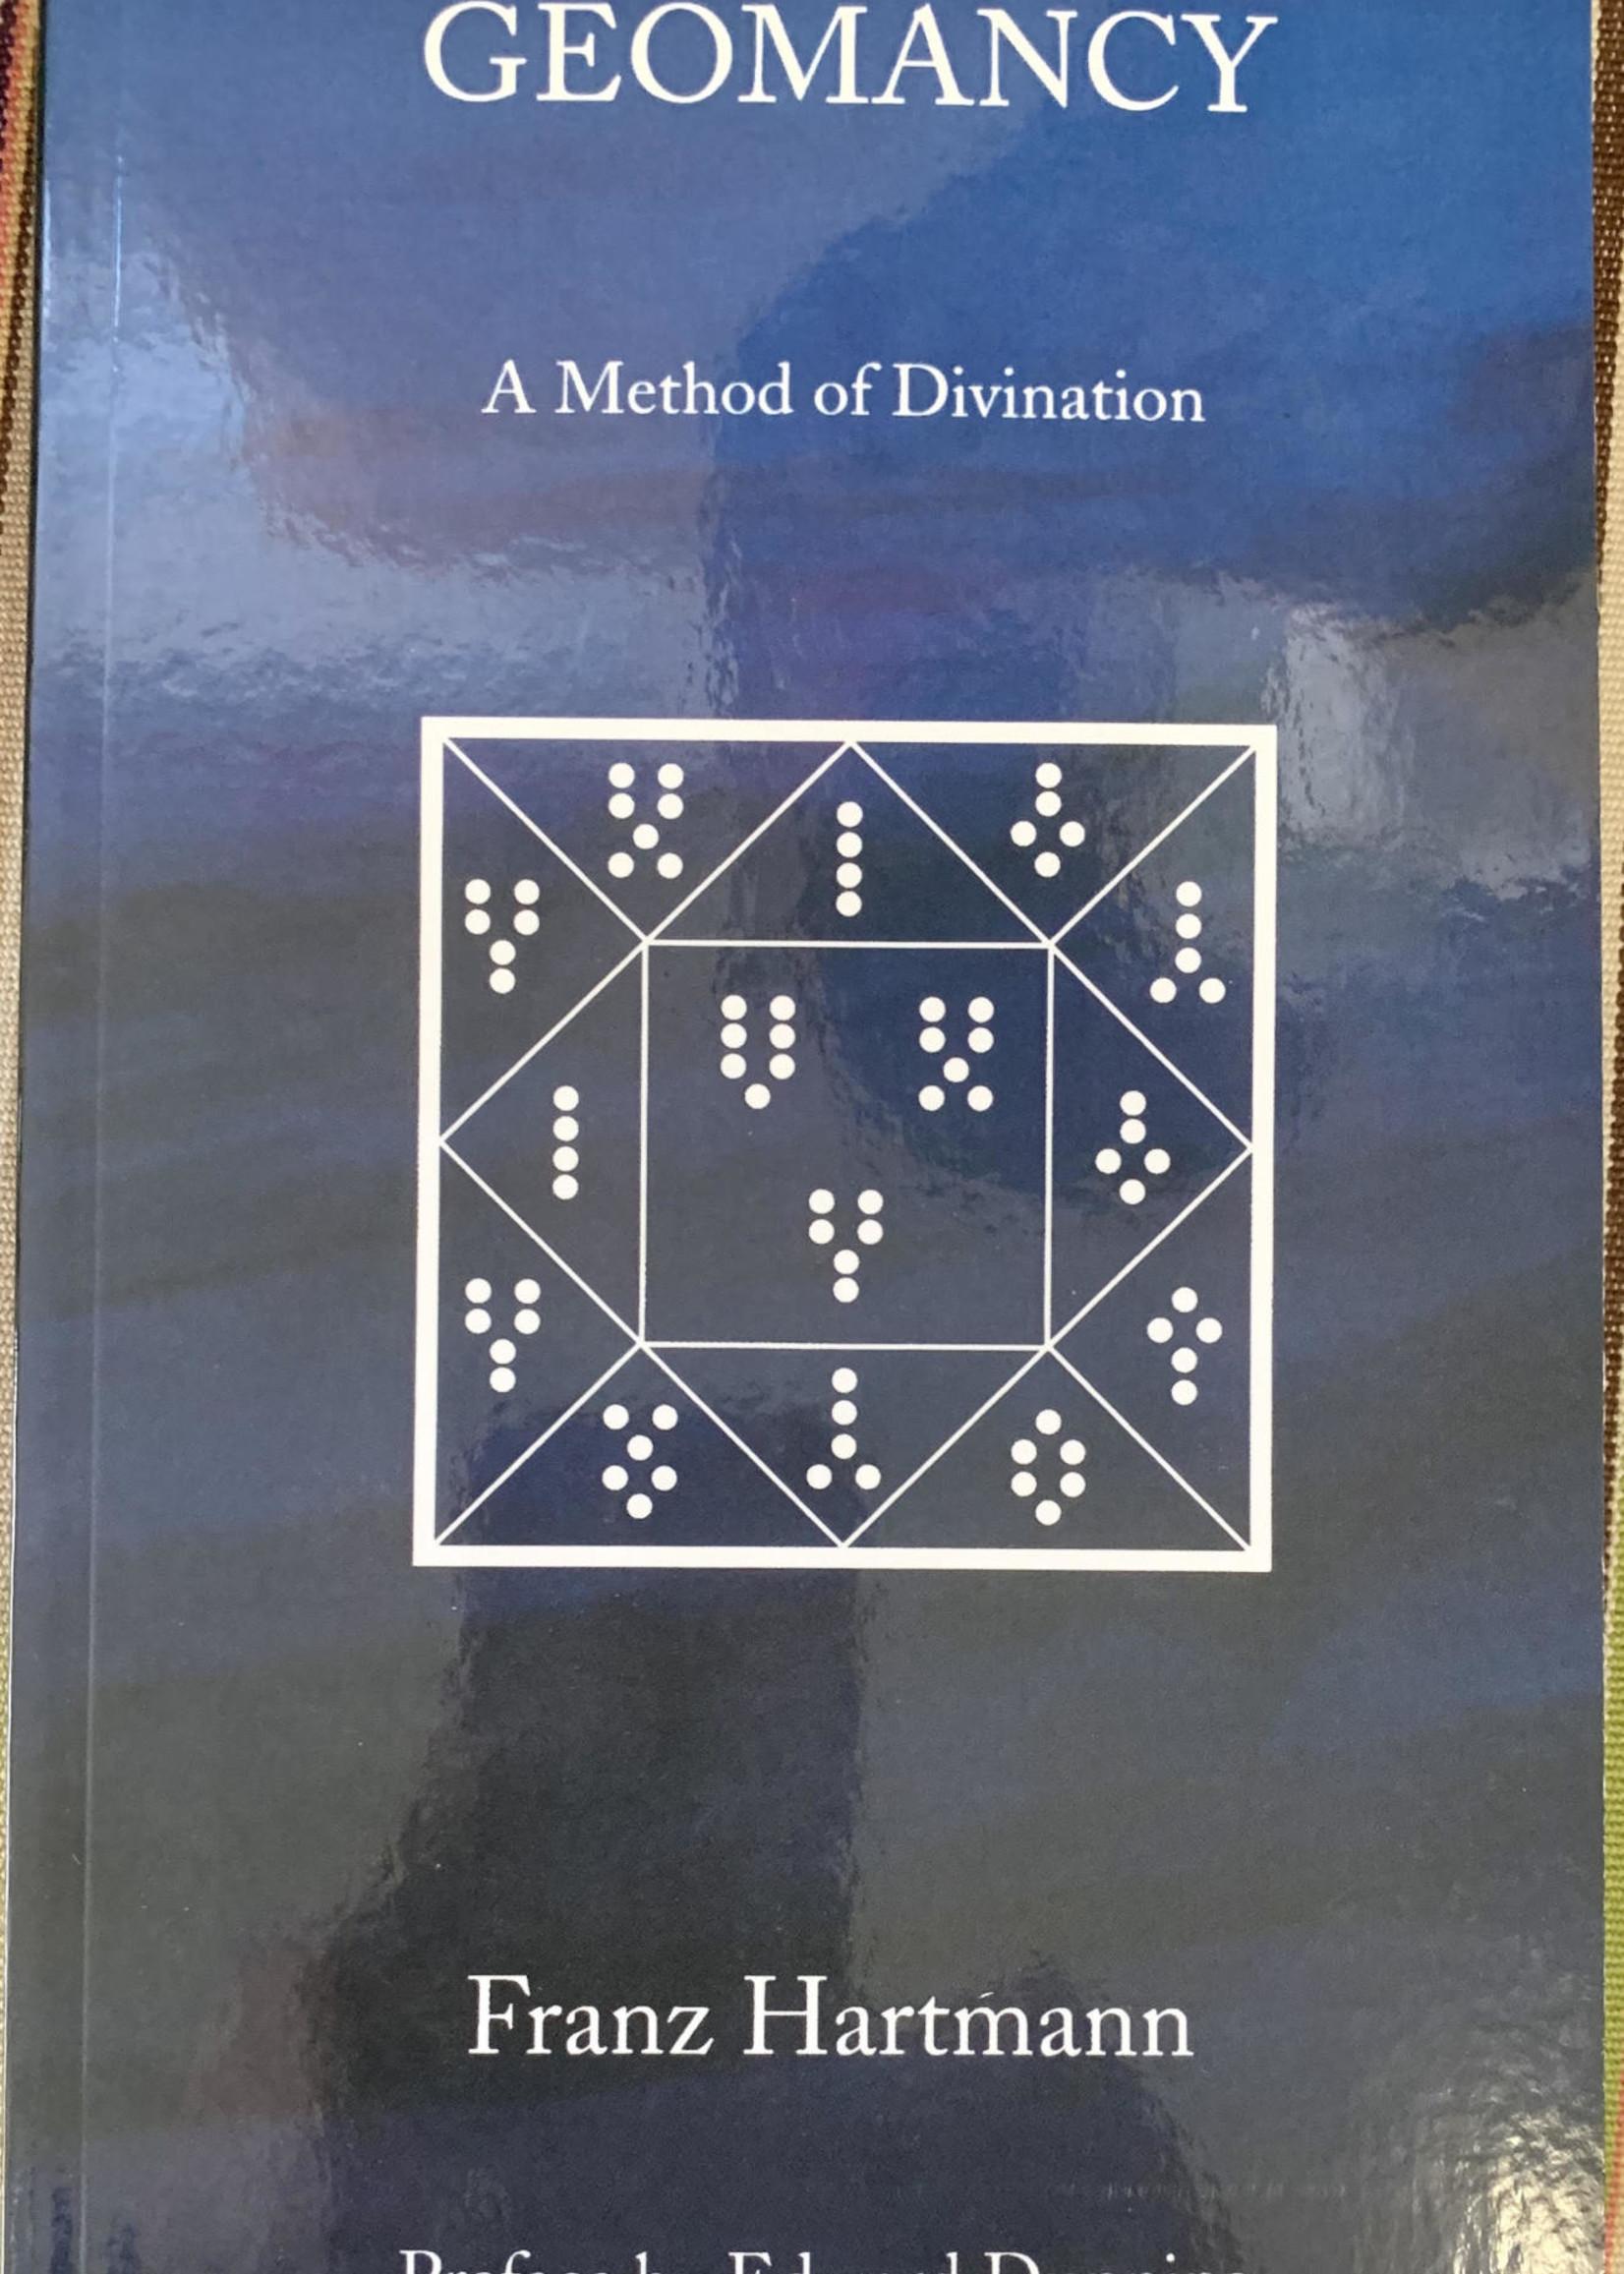 Geomancy A Method for Divination - Franz Hartmann